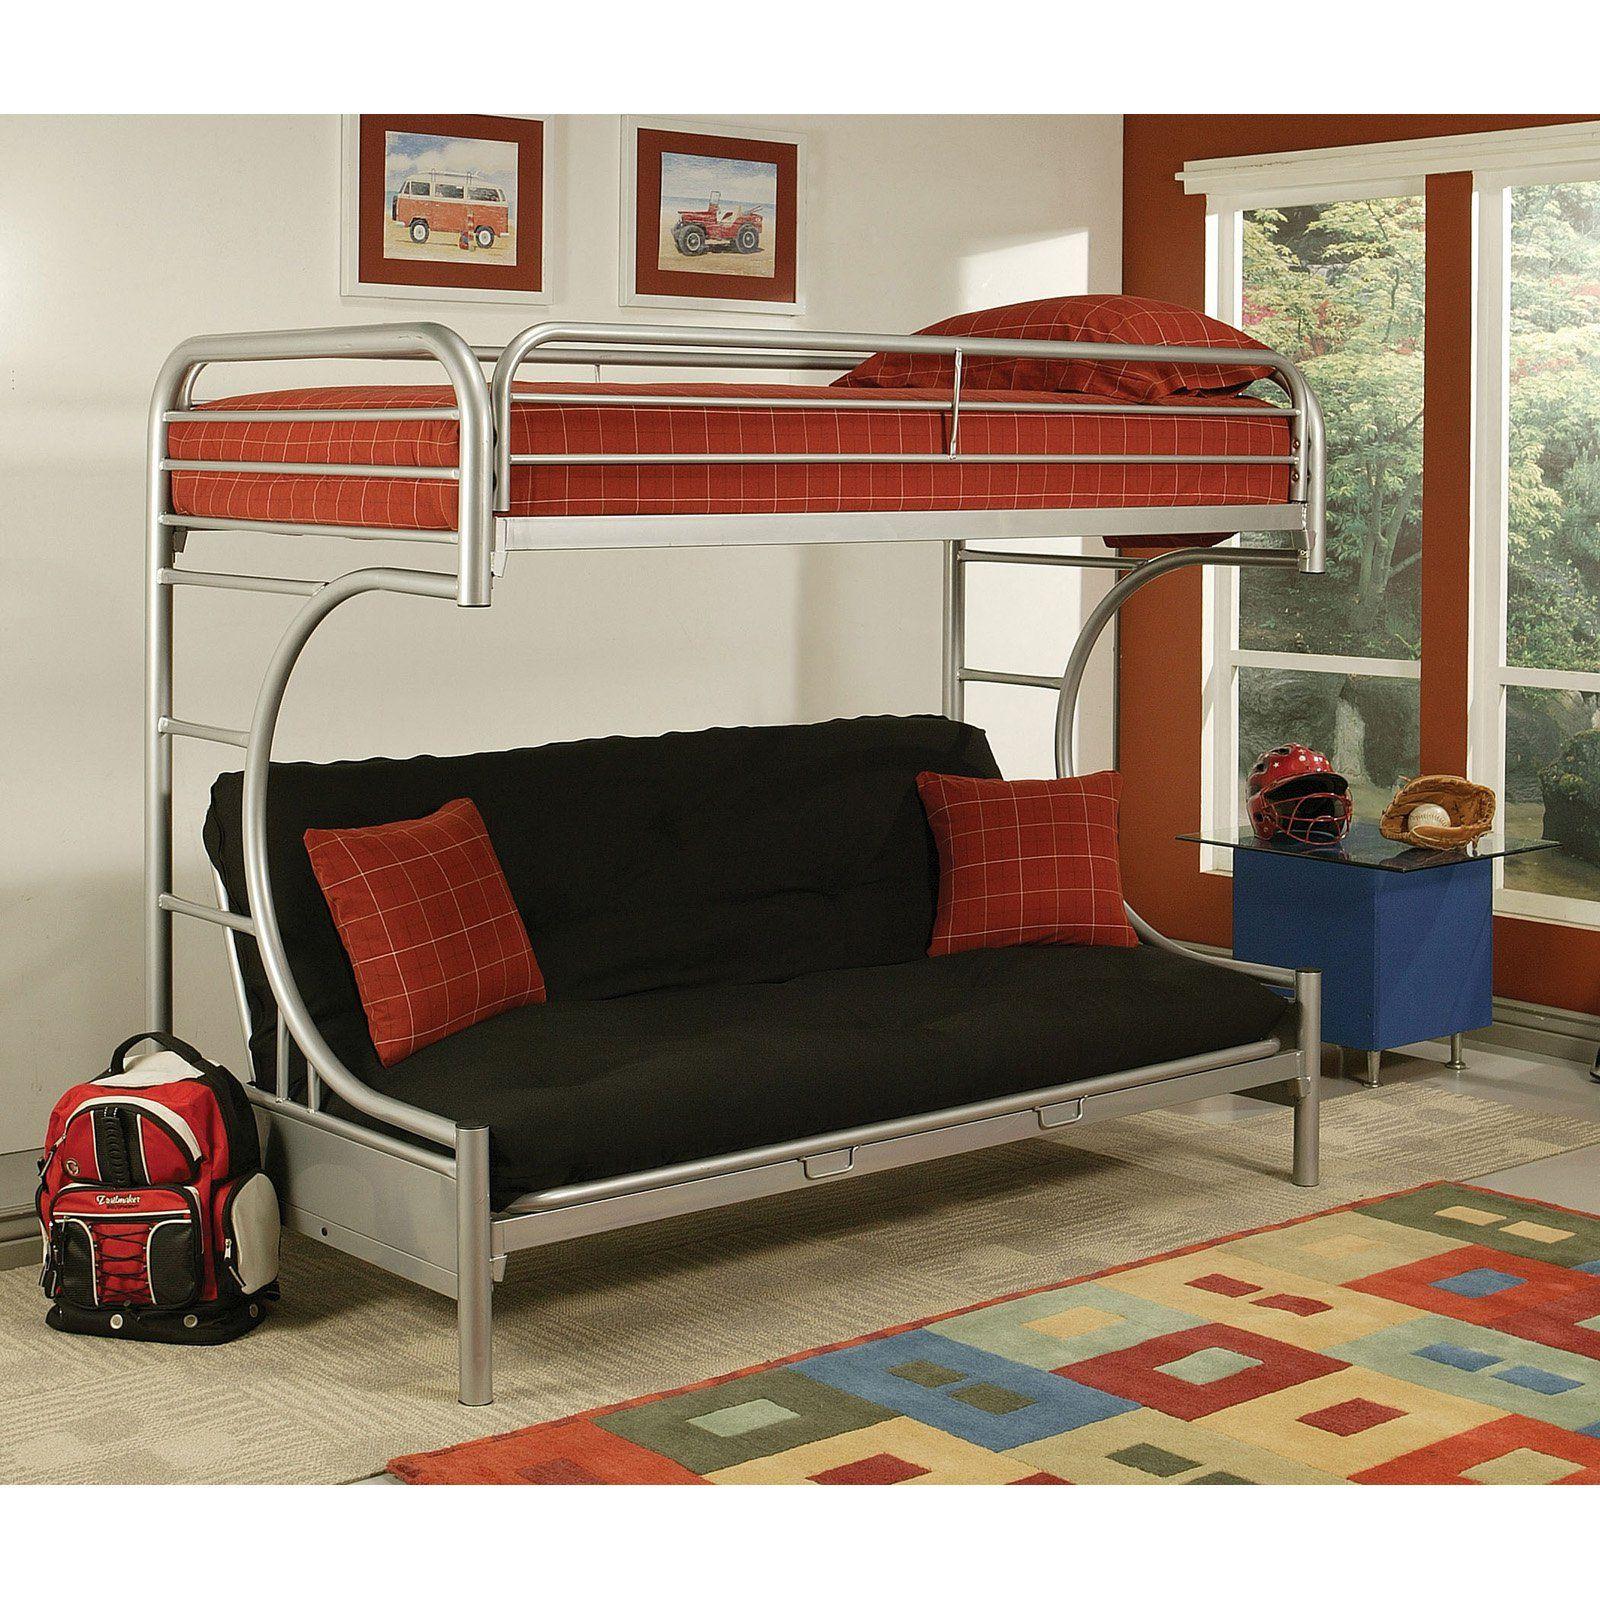 Acme Furniture Eclipse Twin Xl Over Full Futon Bunk Bed Futon